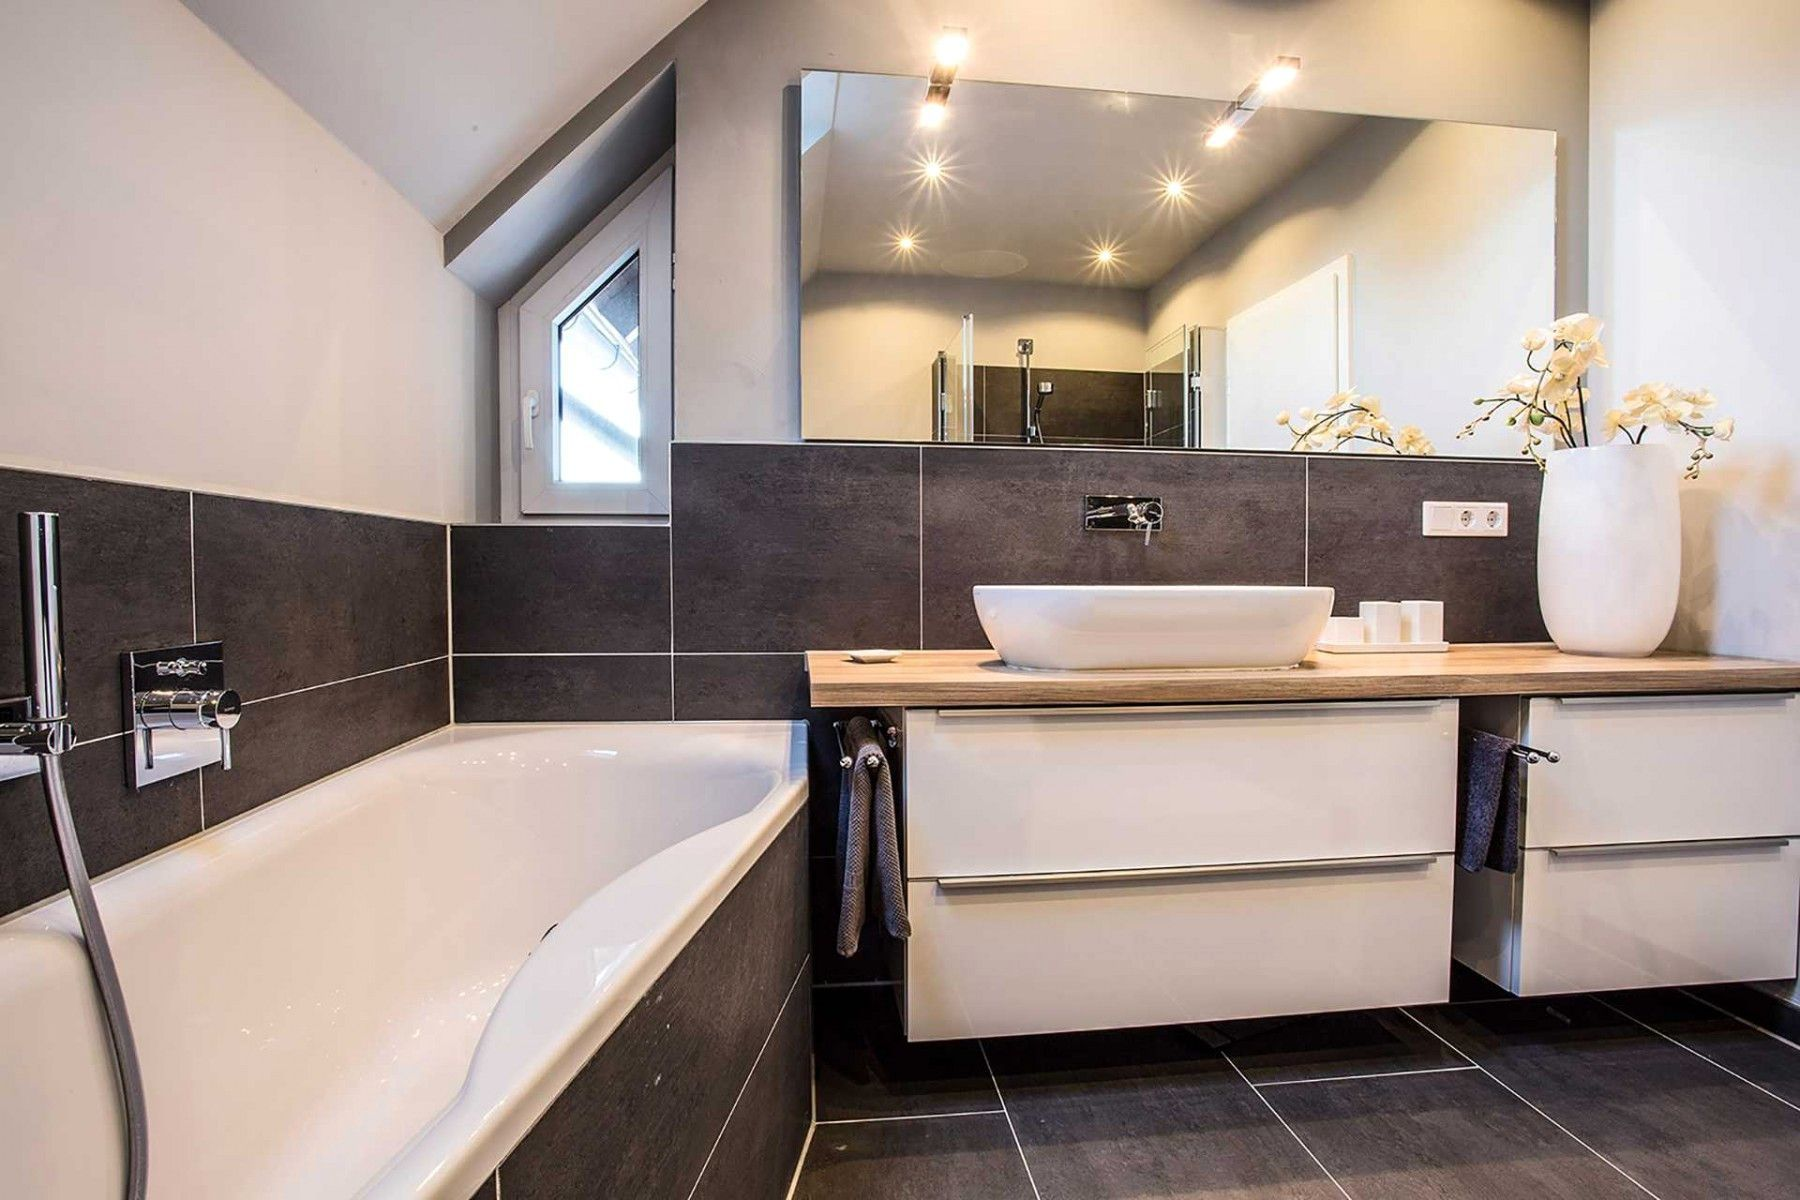 8 Badezimmer Grau Weiss Holz Badezimmer Badezimmer Badezimmer Eintagamsee Main Bathroom Ideas Bathroom Layout Wood Bathroom